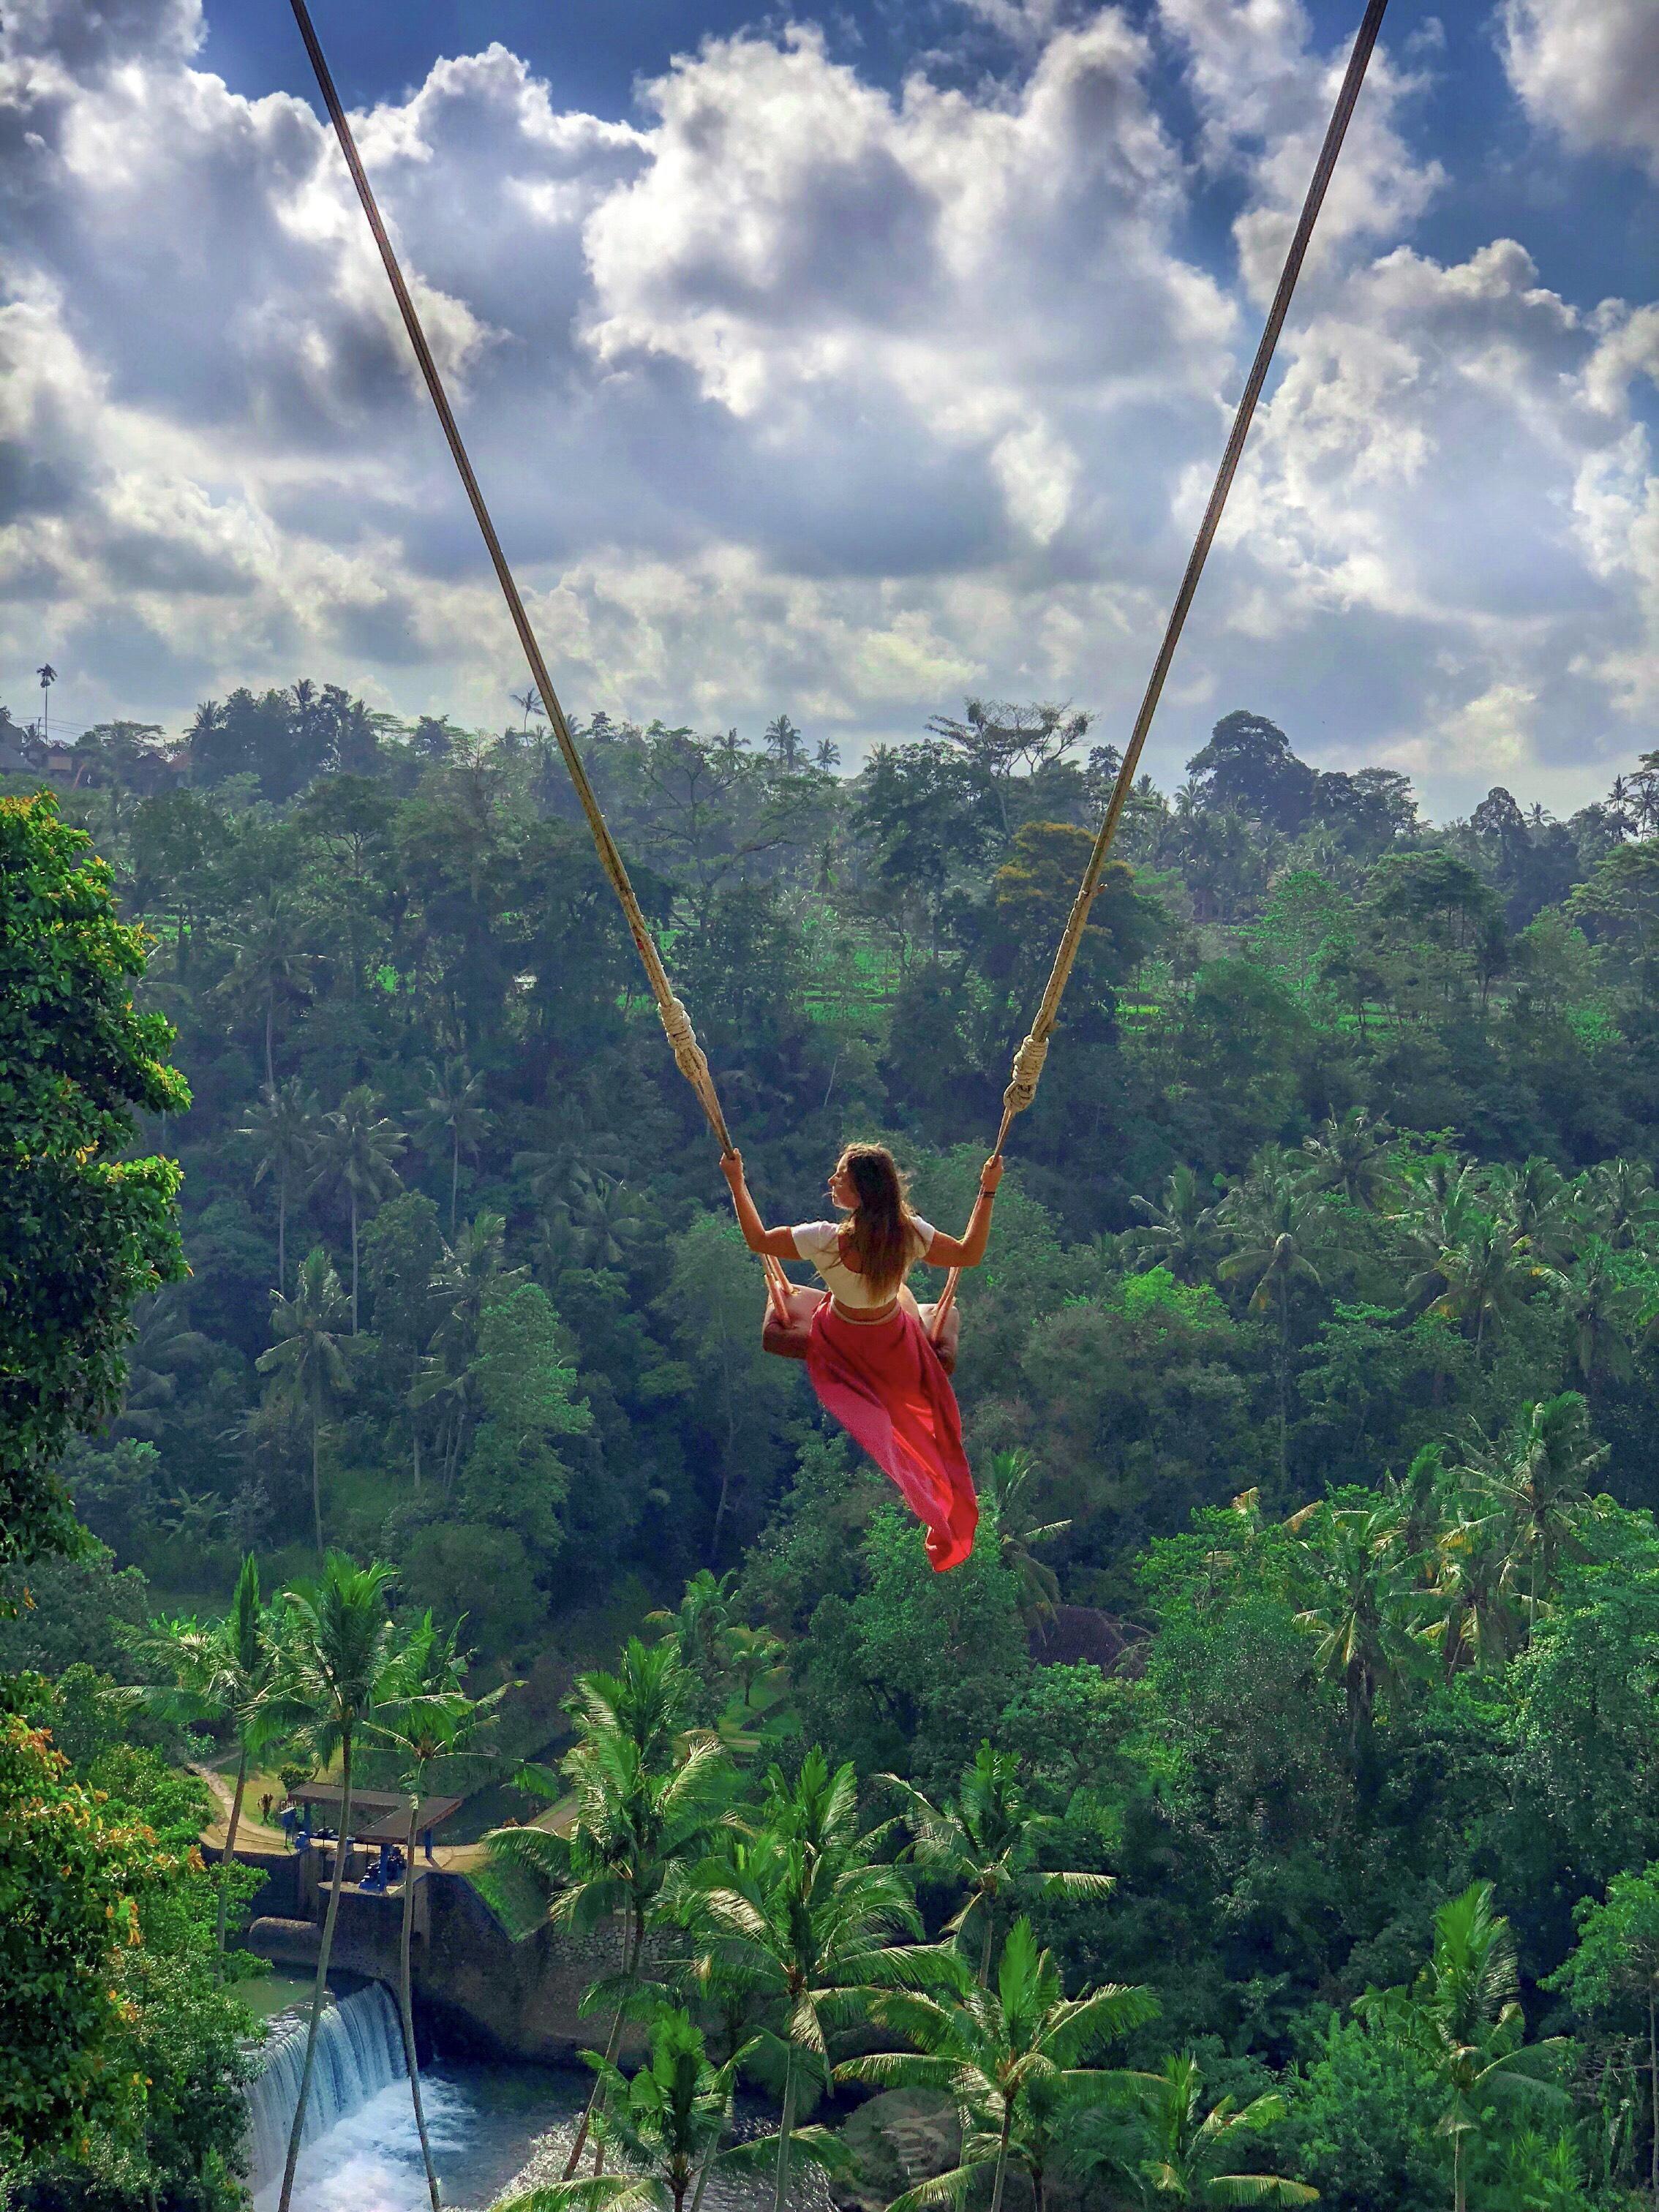 巴厘岛秋千 Bali Swing